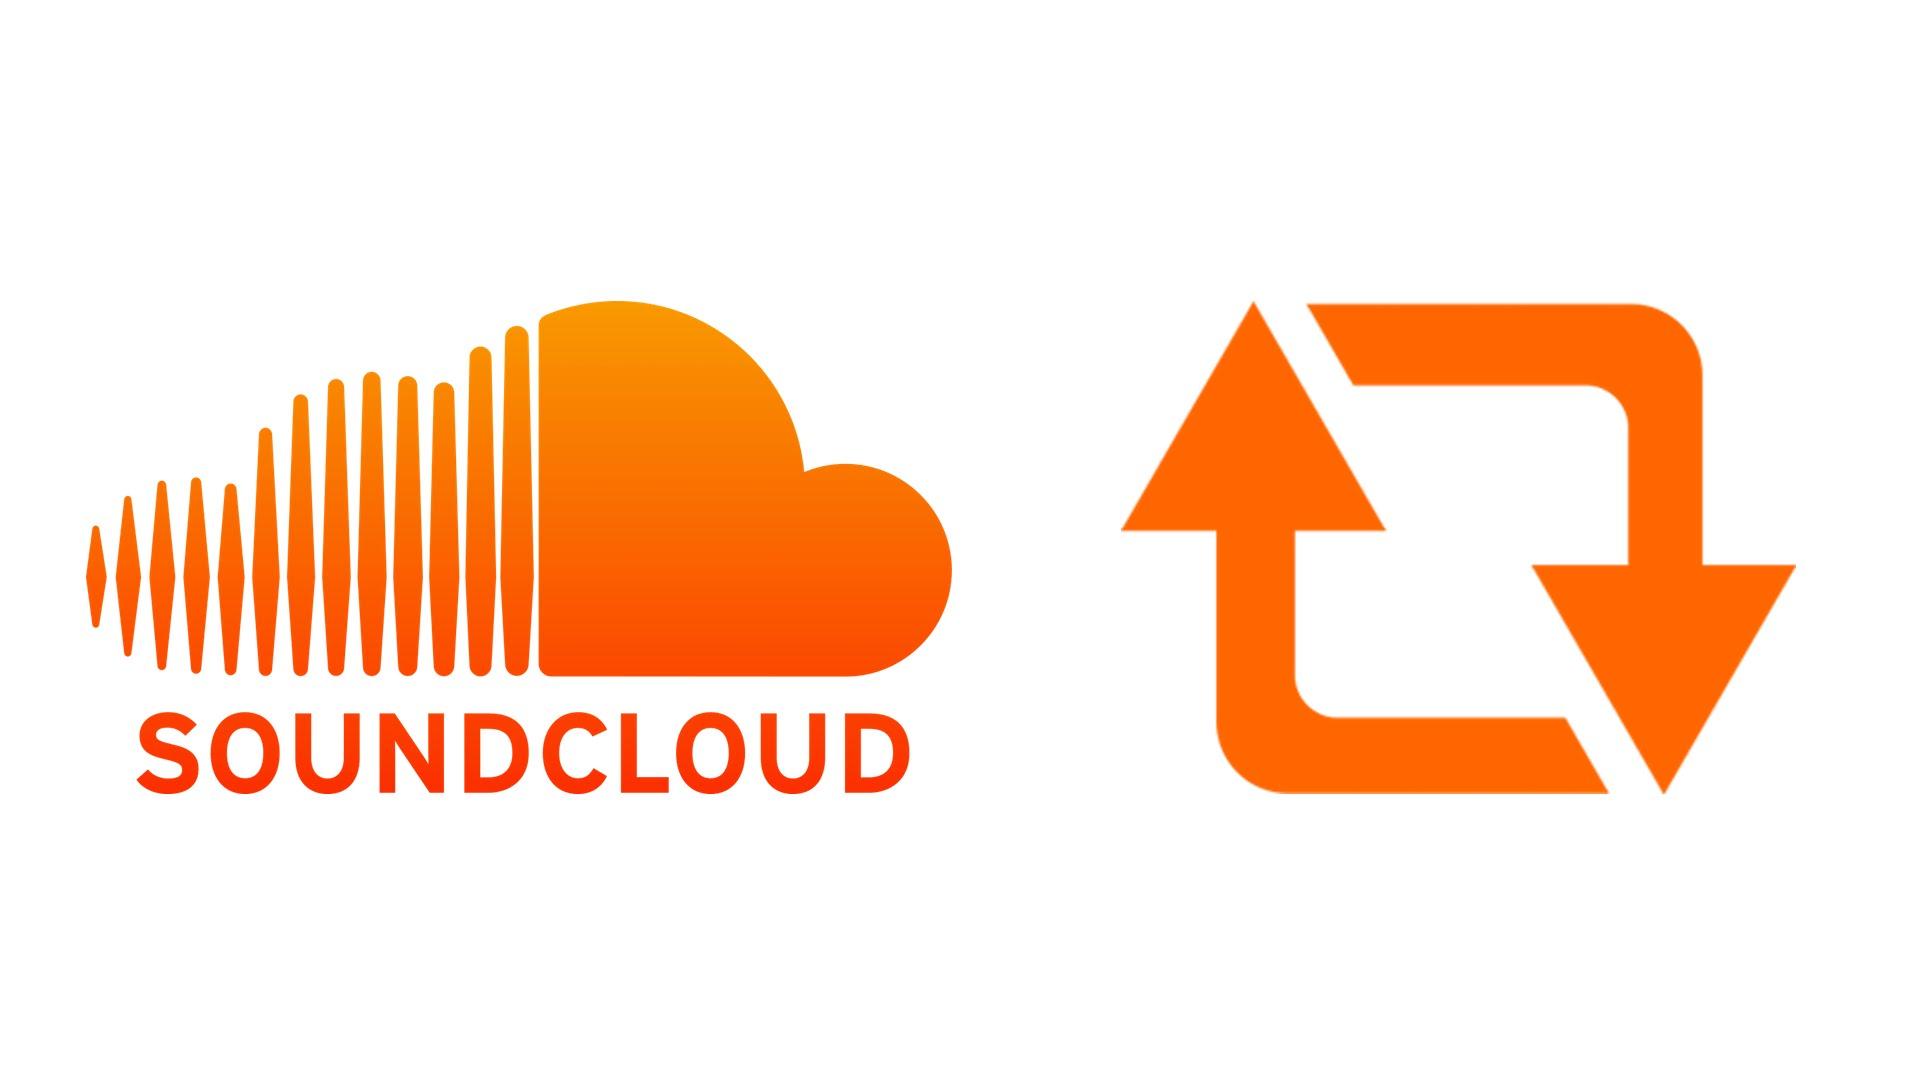 Mengenal Lebih Jauh Tentang SoundCloud